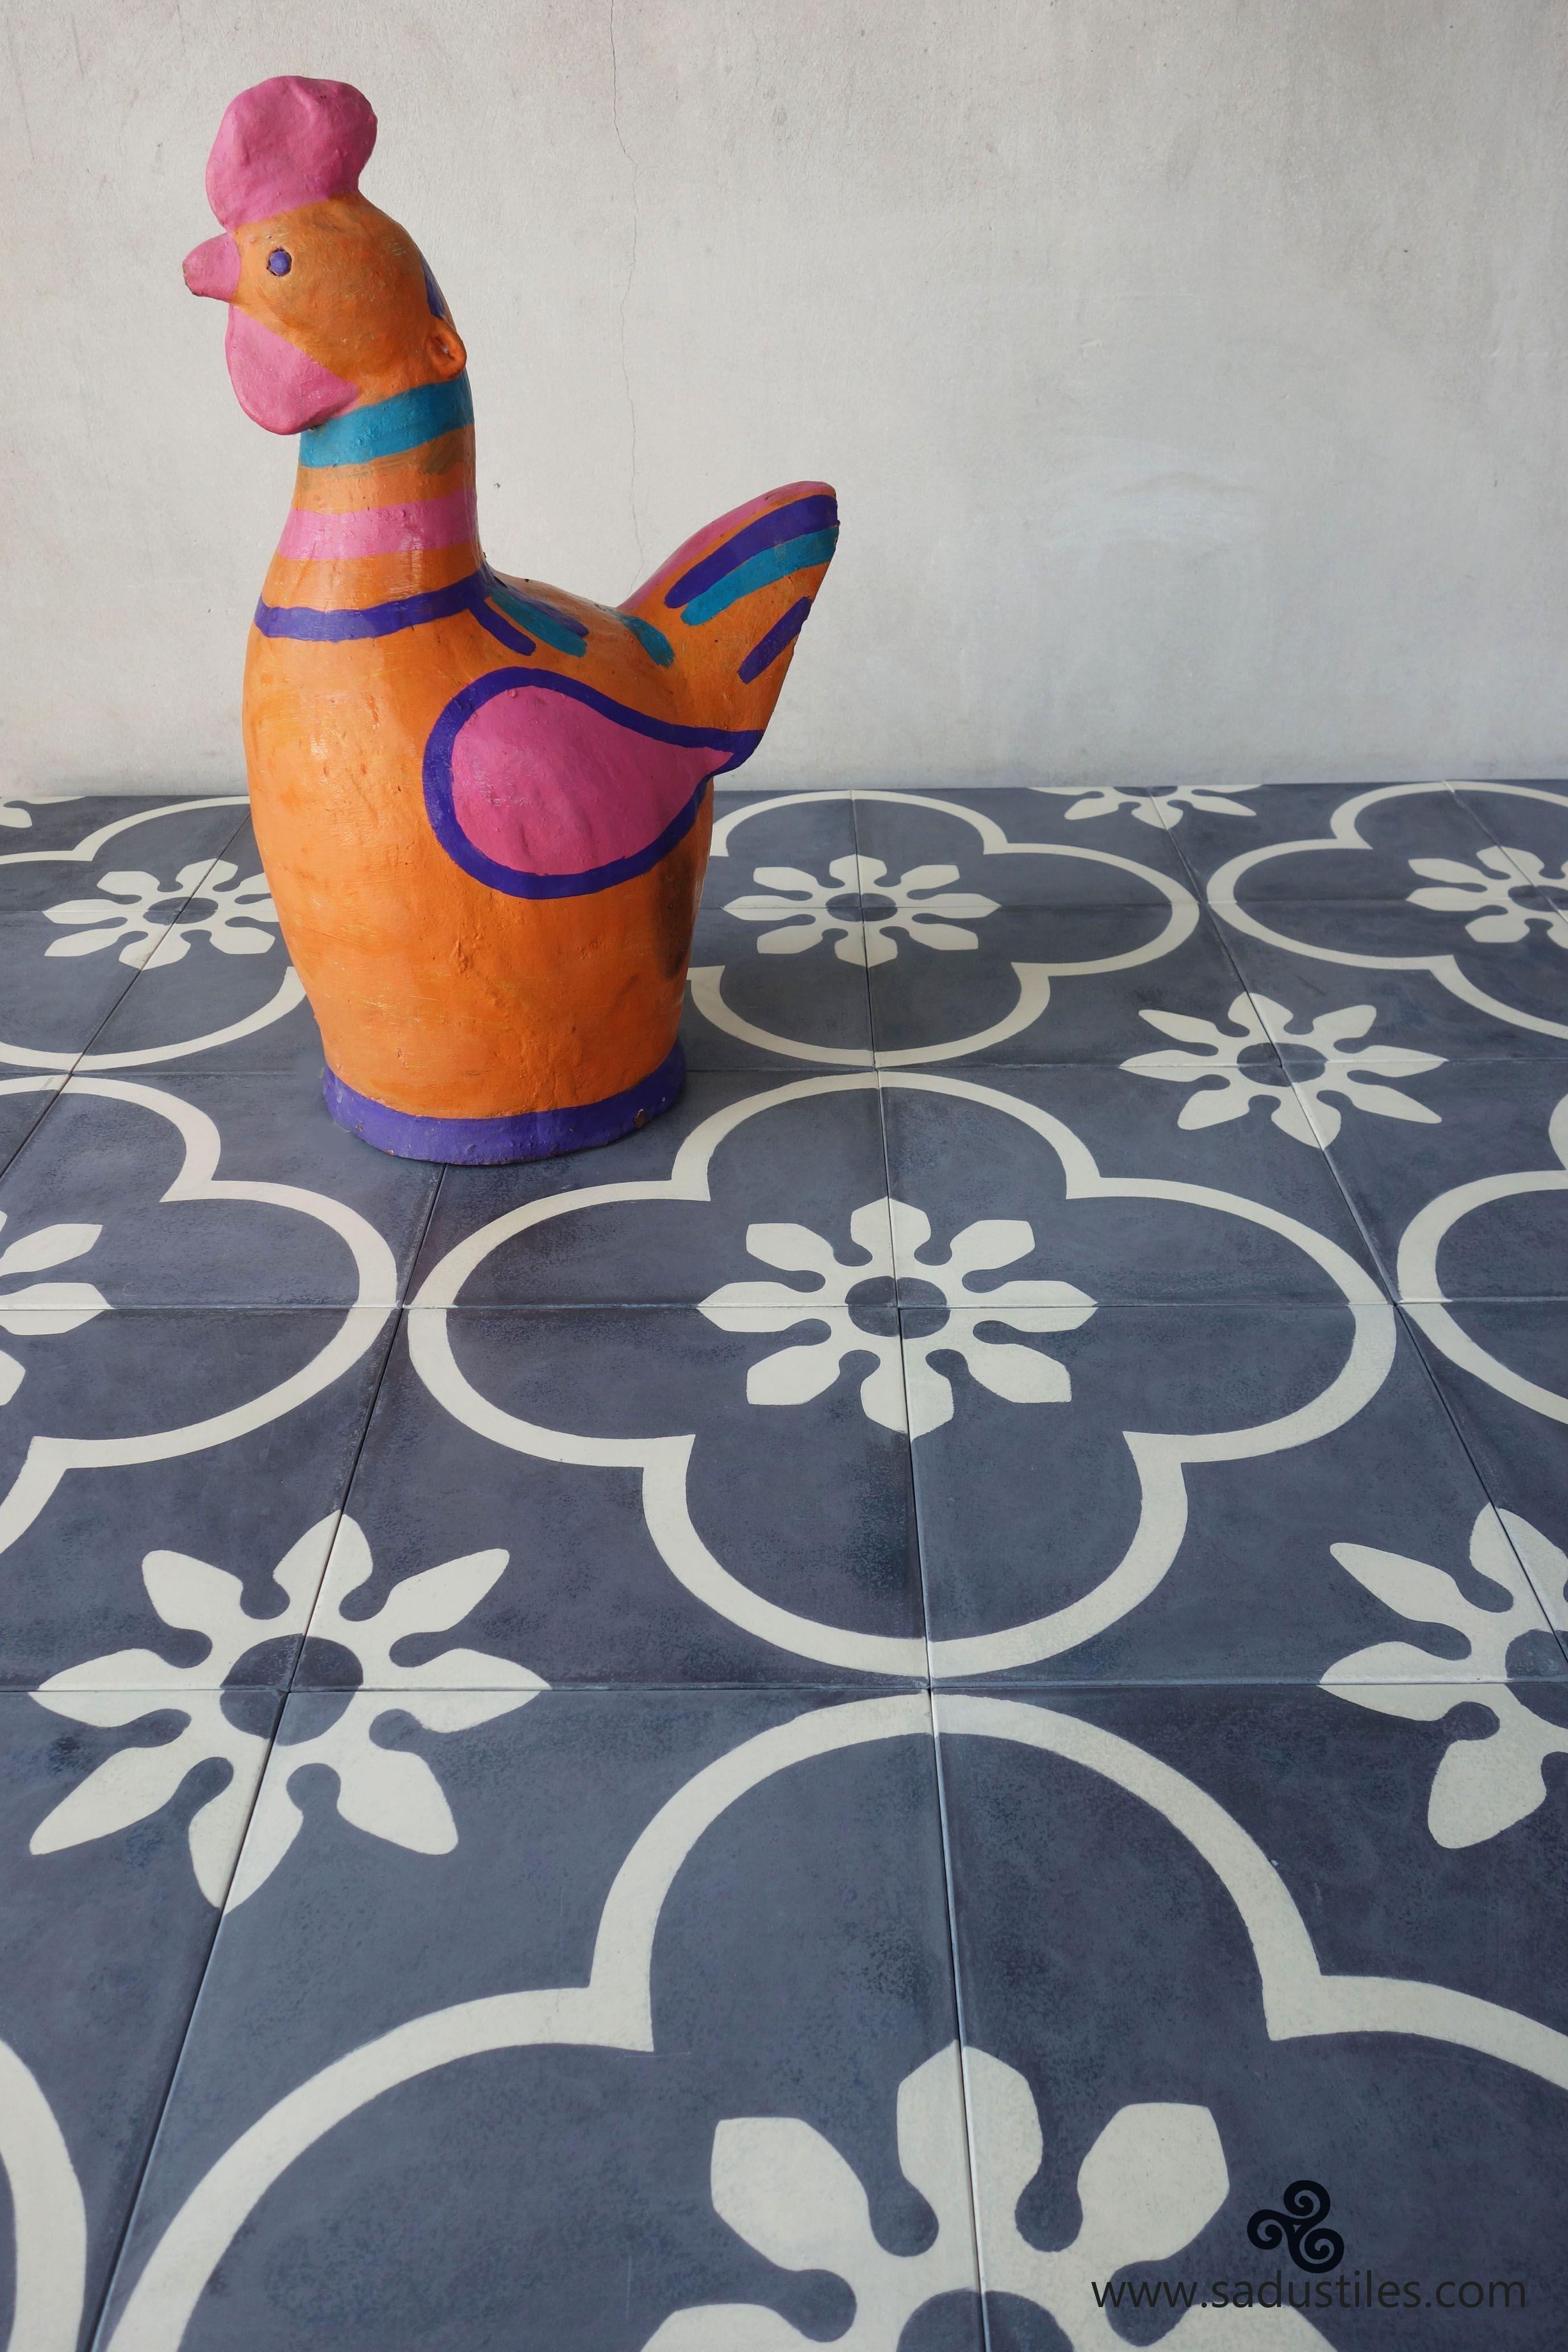 Sadus Tiles Handmade Cement Tiles From Bali Indonesia Cement Tile Tiles Tile Patterns